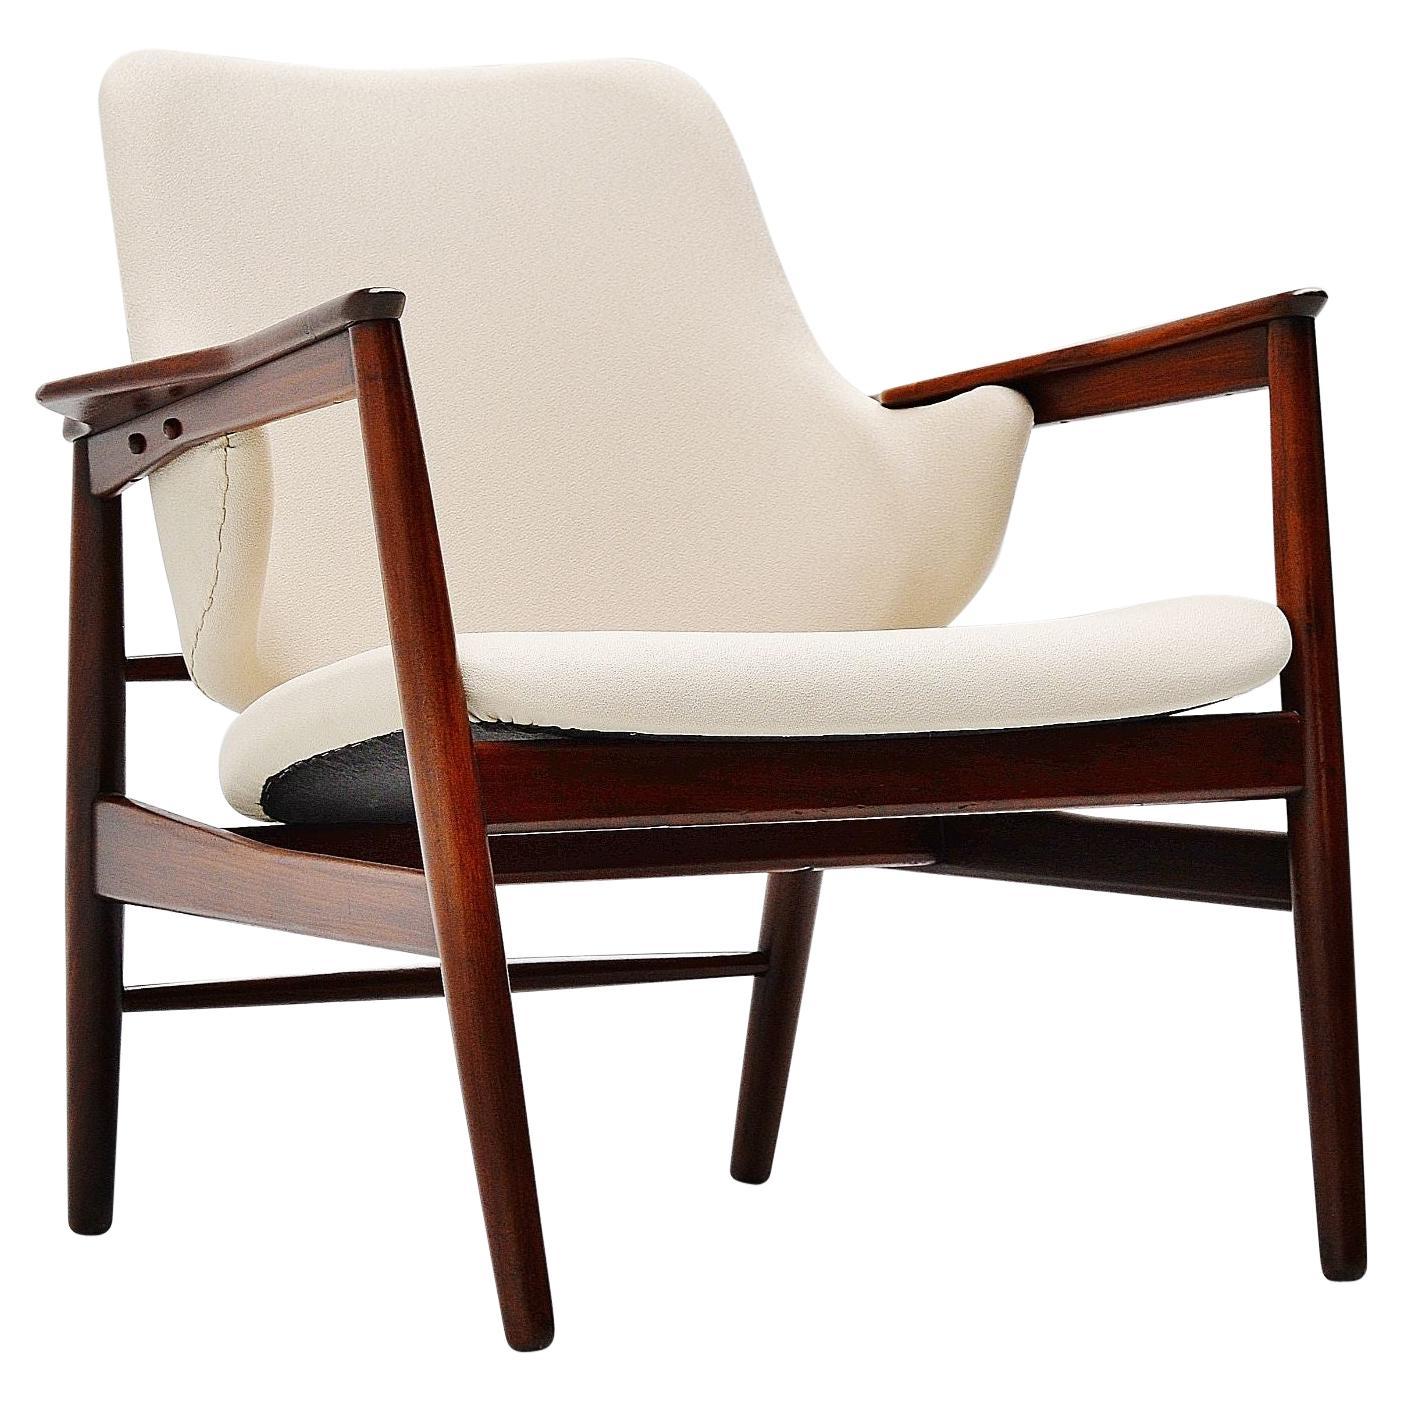 Ib Kofod-Larsen Lounge Chair Christensen & Larsen, Denmark, 1953